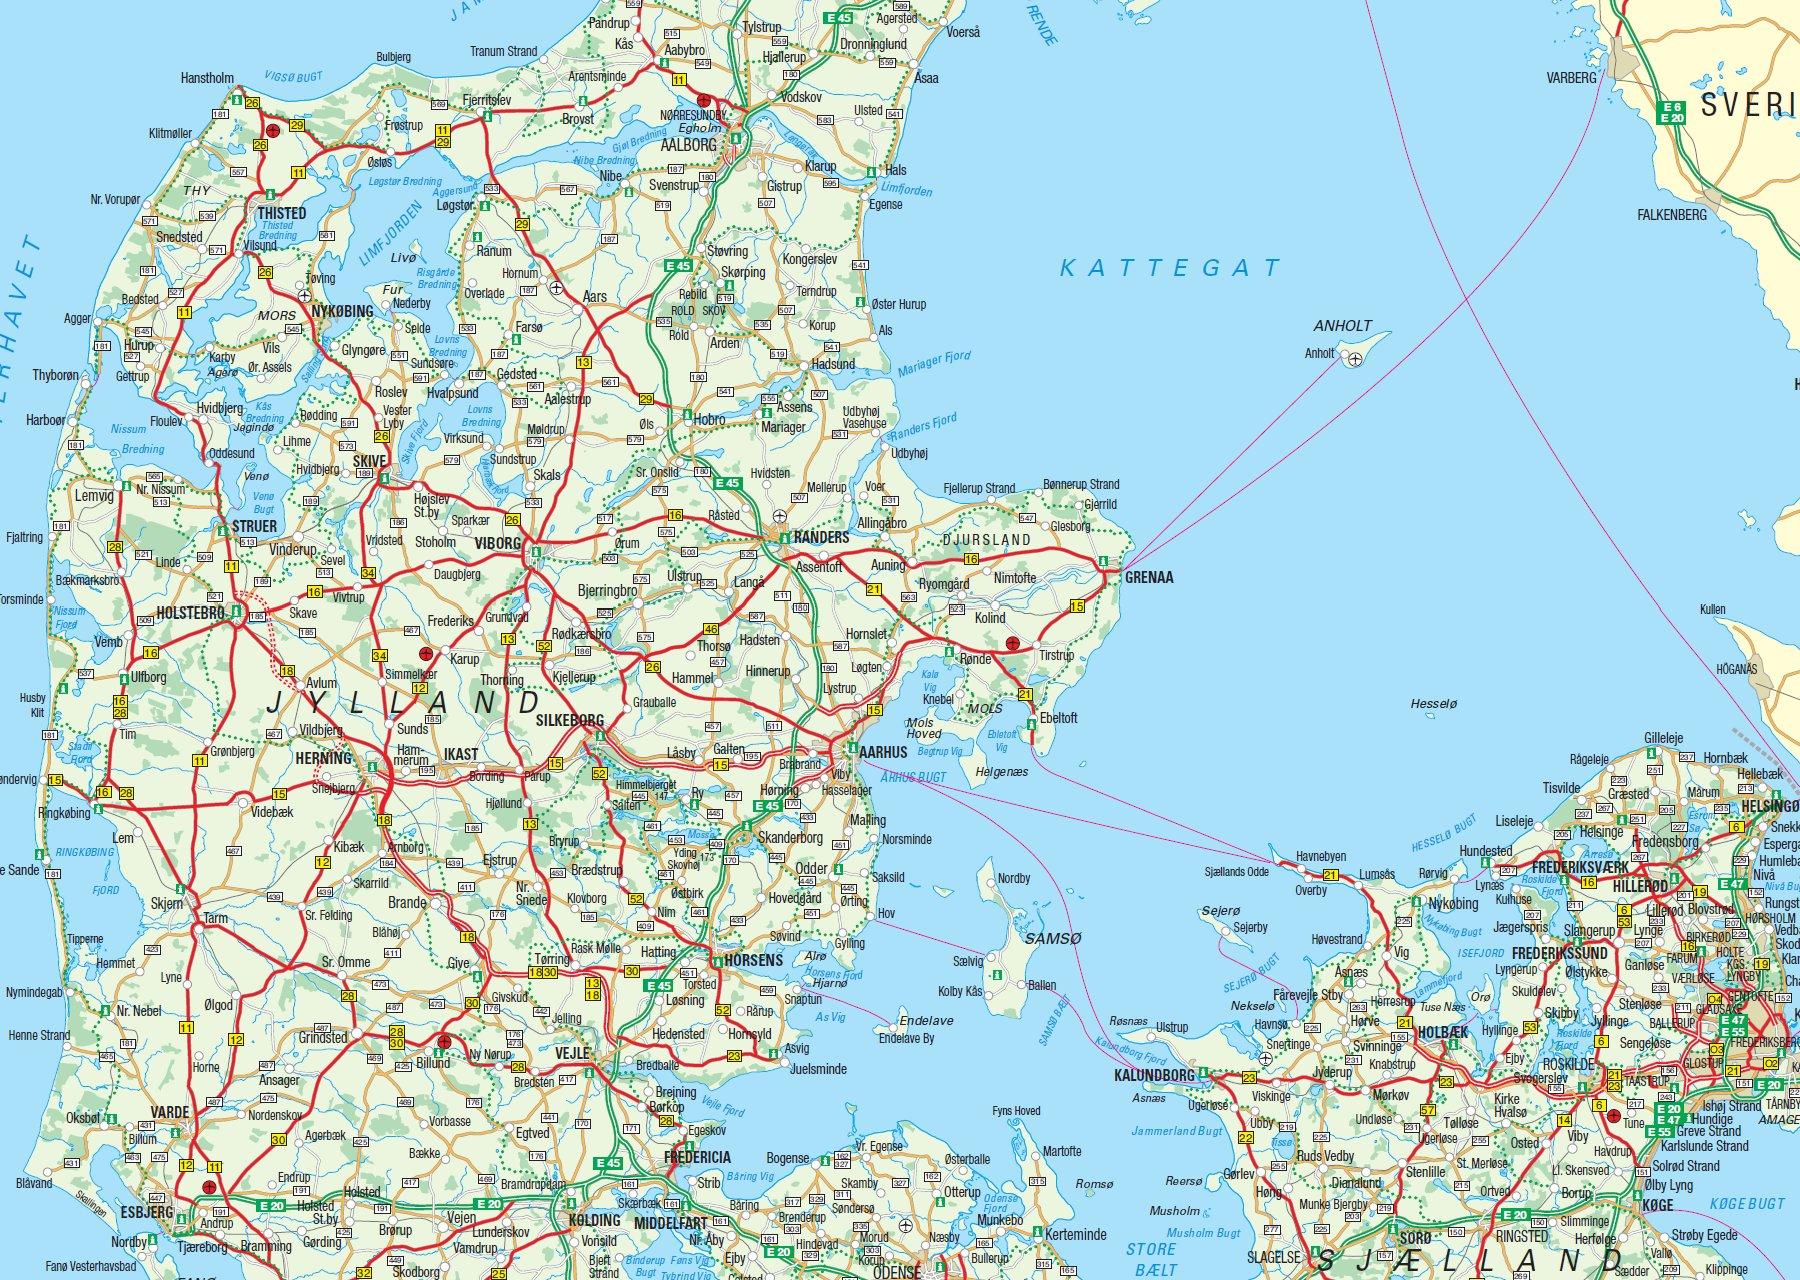 Multimaps Danmarkskort